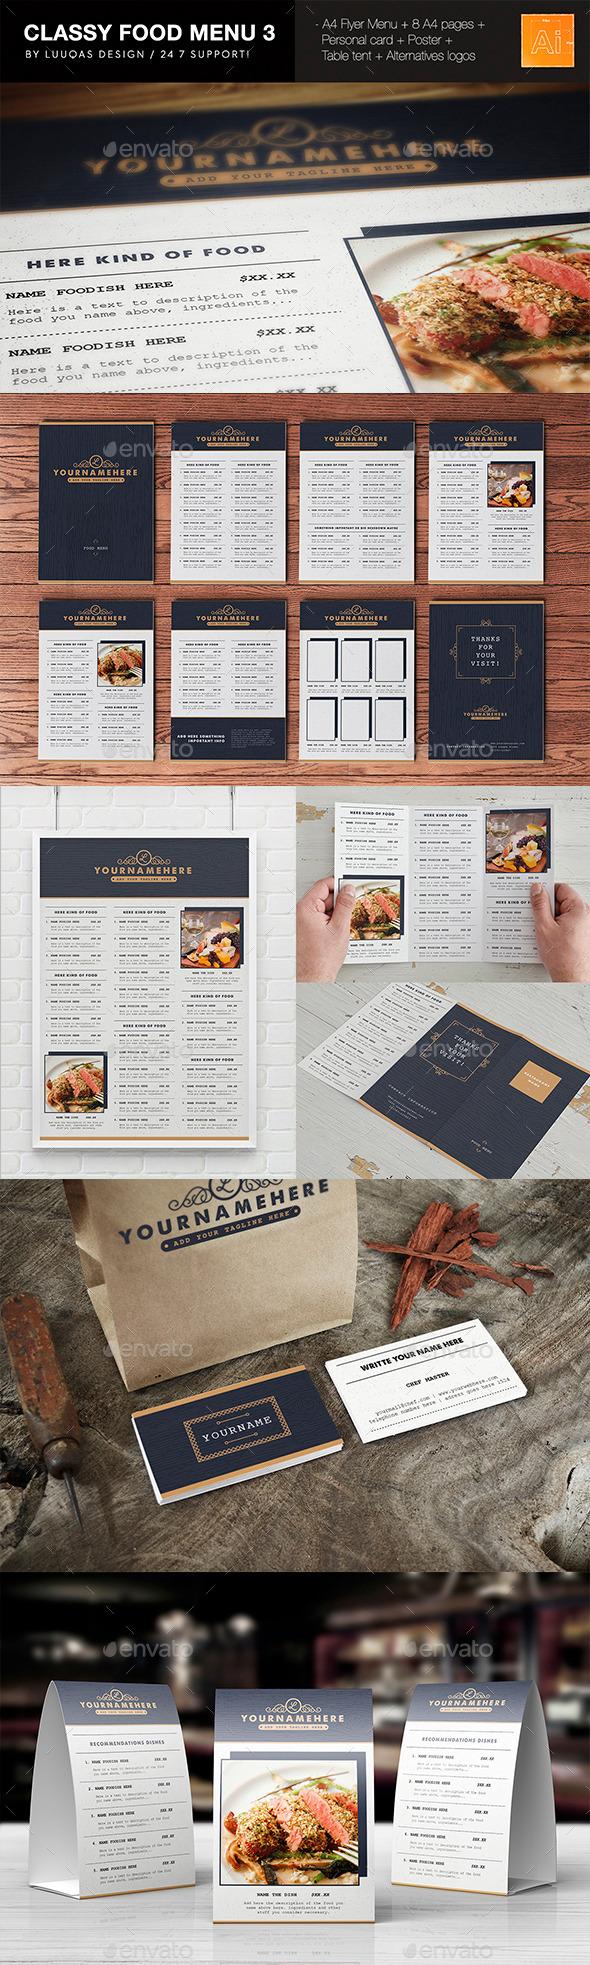 Classy Food Menu 3 - Food Menus Print Templates